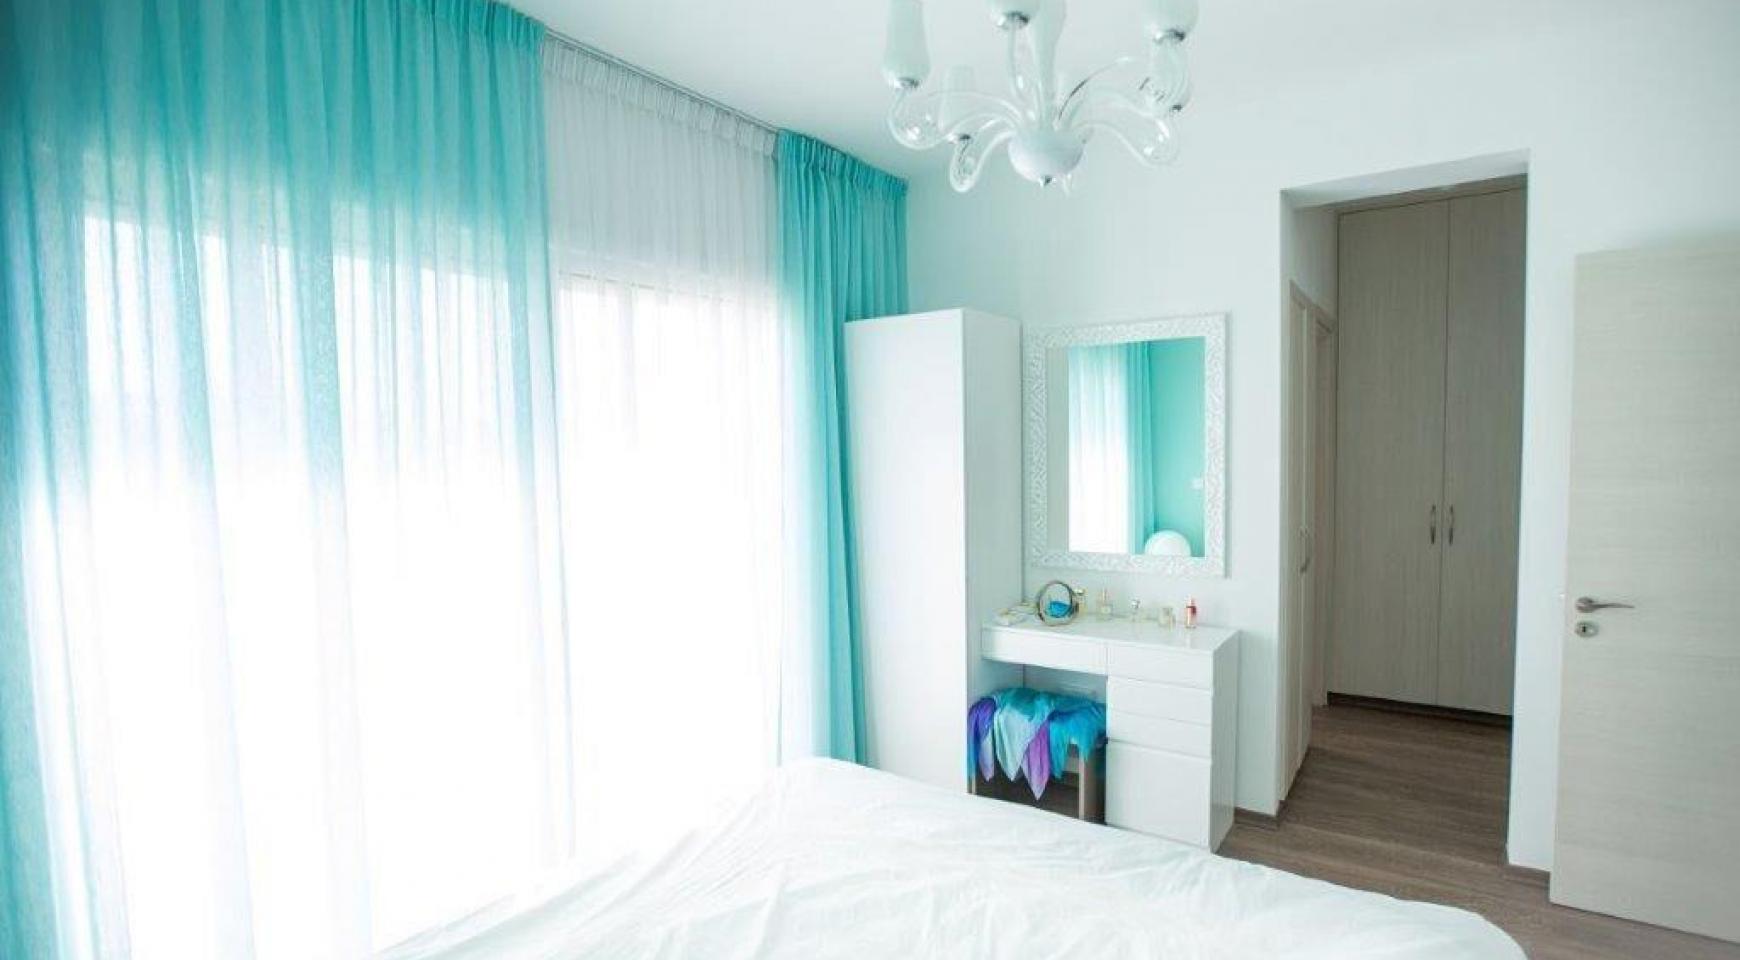 3 Bedroom Villa in Ipsonas Area - 7